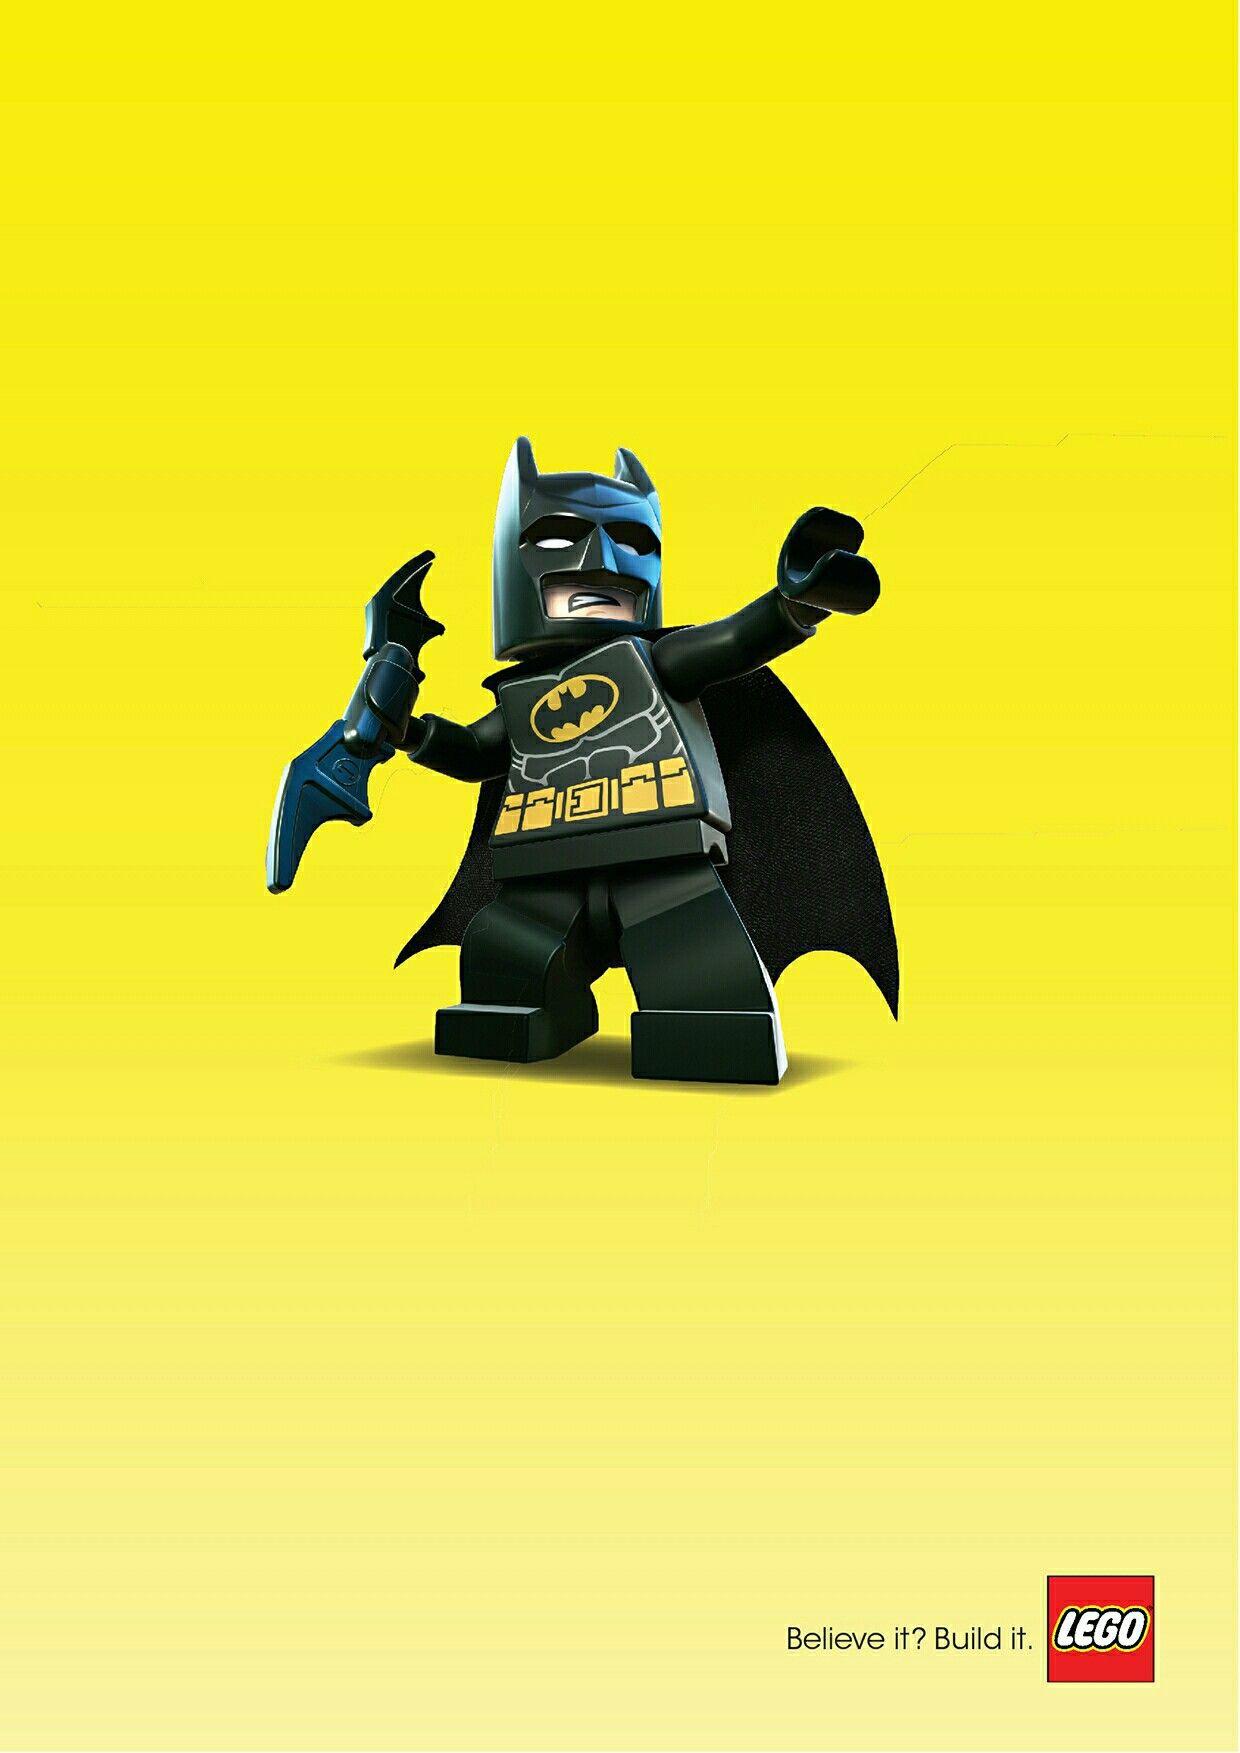 Pin by faizanhussain on Blog   Pinterest   Superhero party, Batman ...